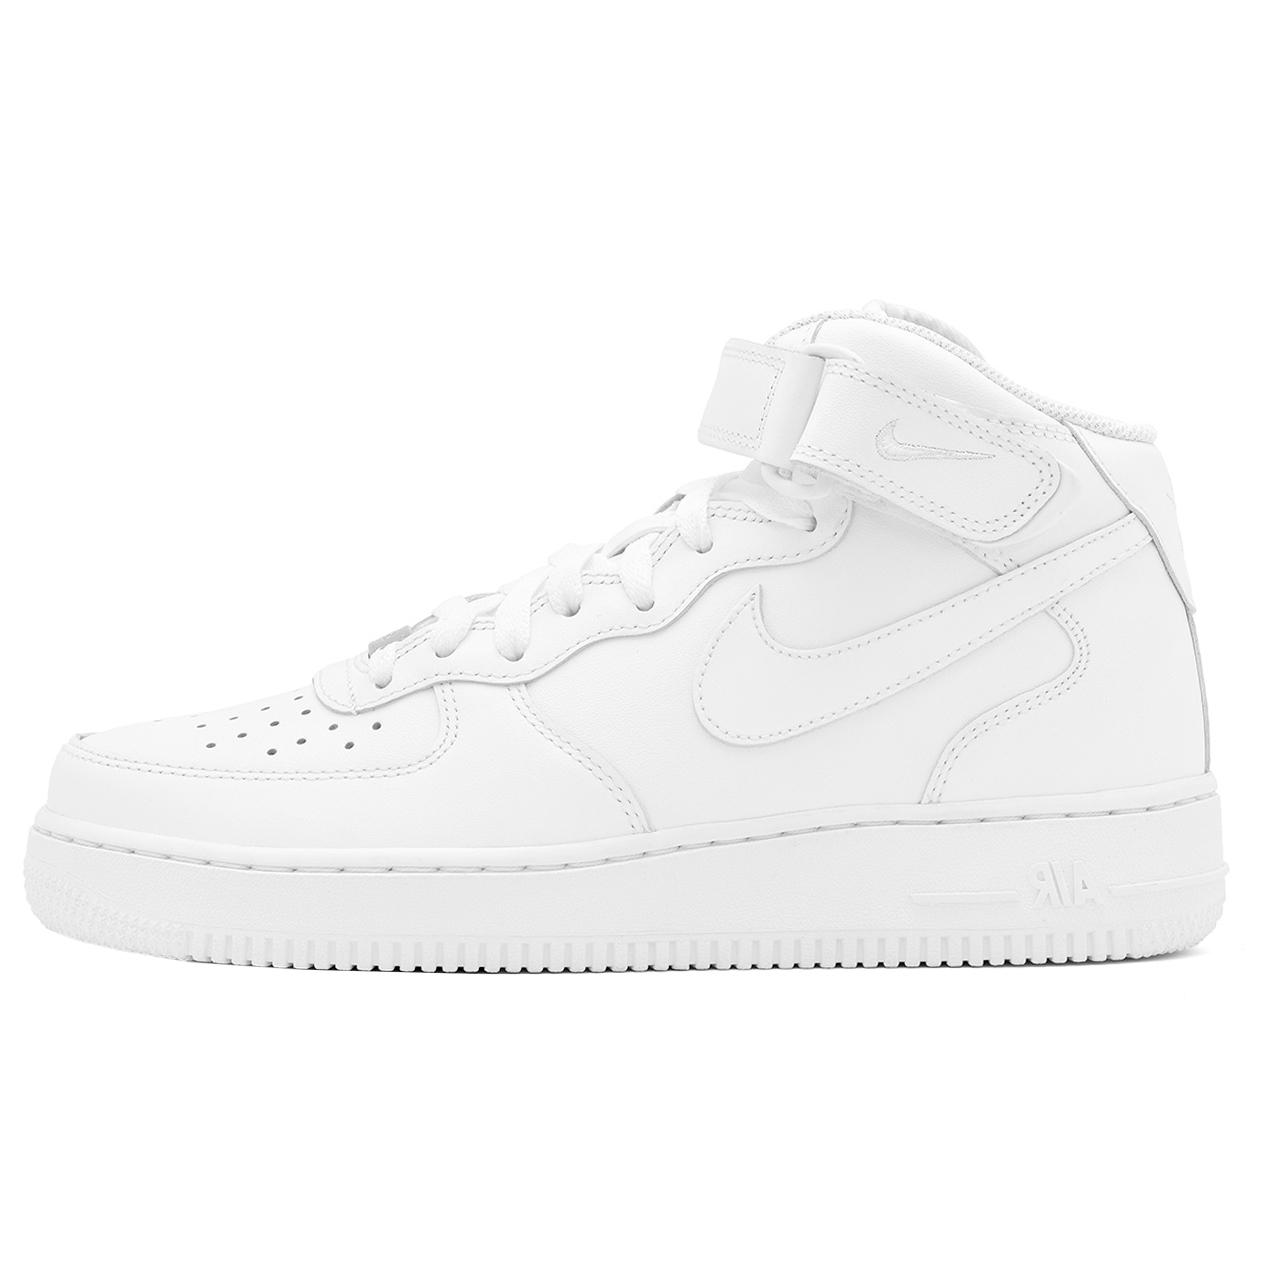 کفش راحتی زنانه نایکی مدل Air Force  کد 367895